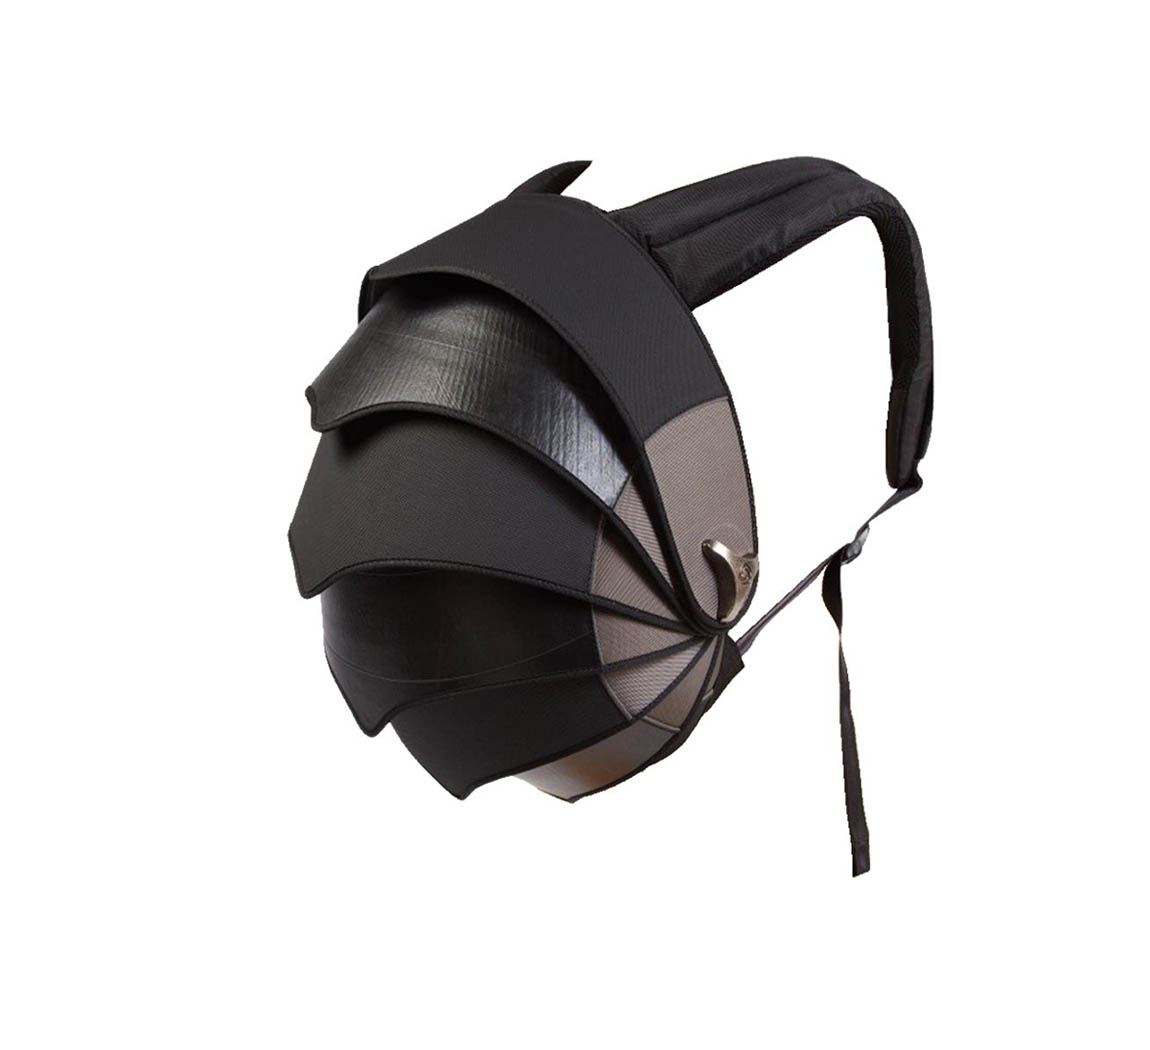 Sac recycl sac pangolin sacs cyclus - Sac a main chambre a air ...